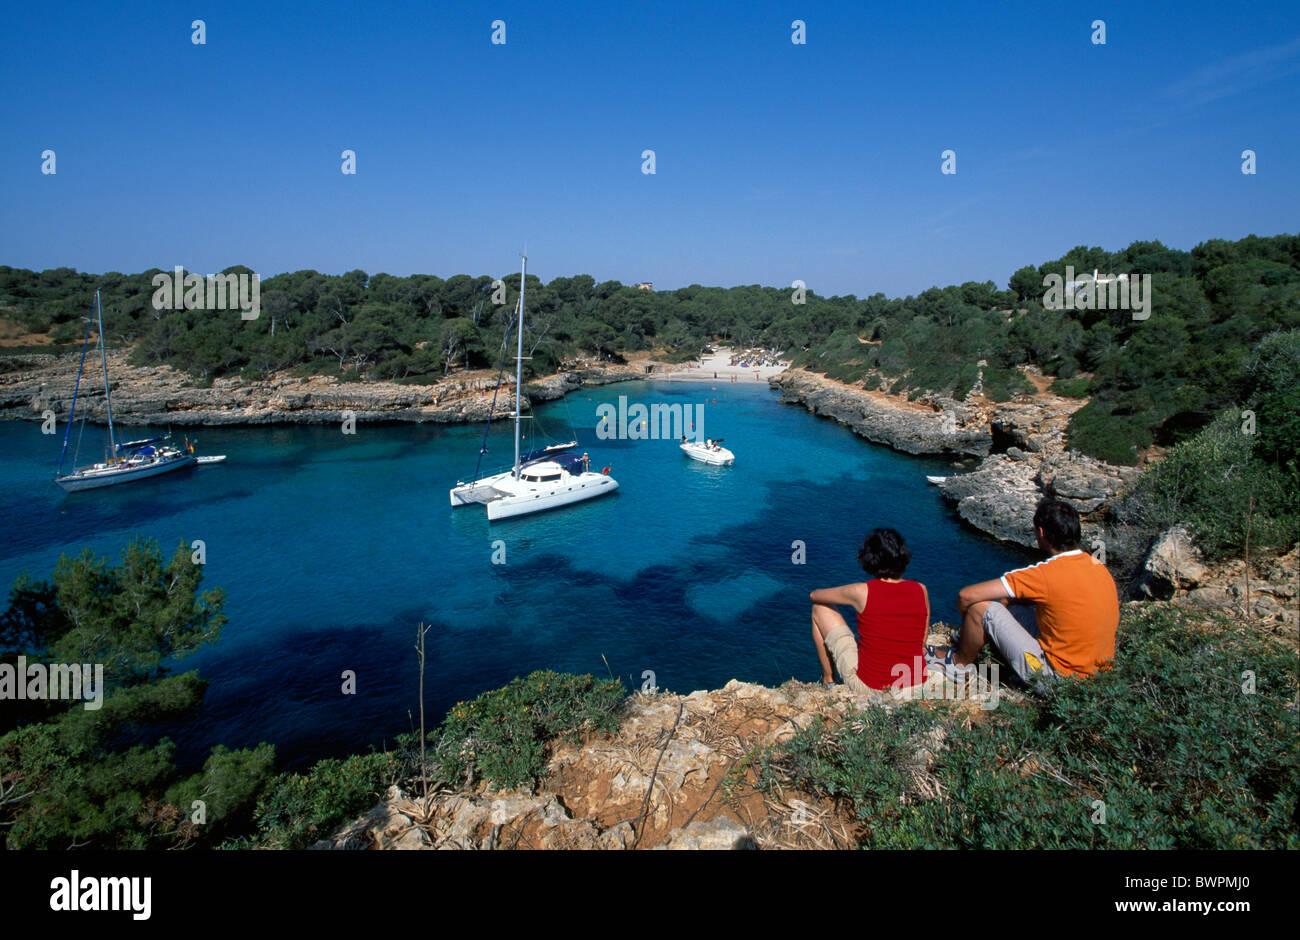 Spain Europe Cala Sa Nau Majorca Balearic Islands Europe Mediterranean Sea coast island Majorca bay Cala Sa - Stock Image